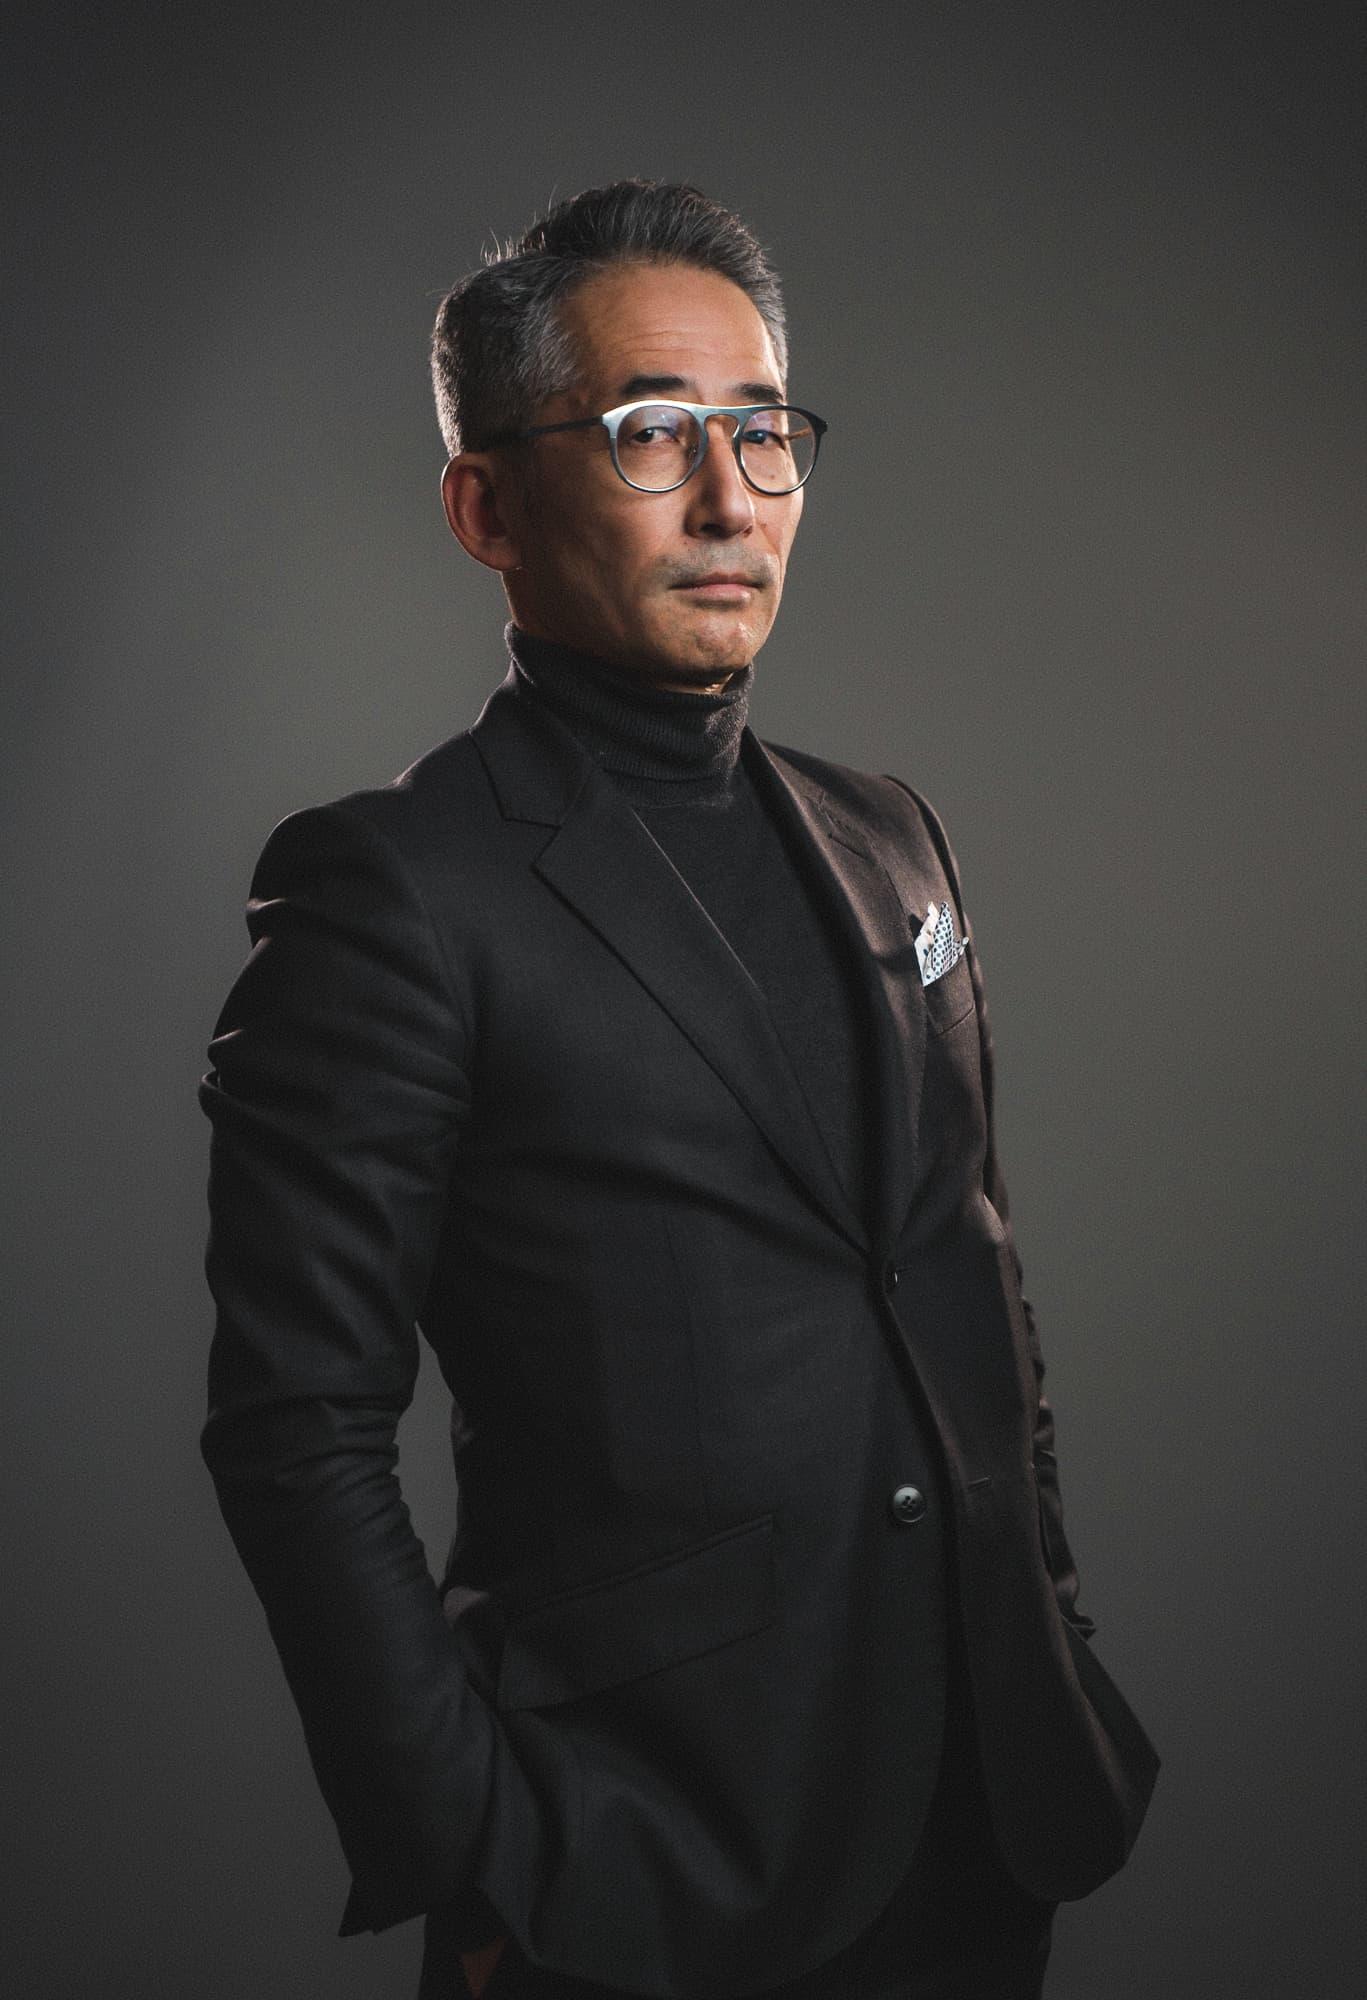 Richard Takai Kelowna